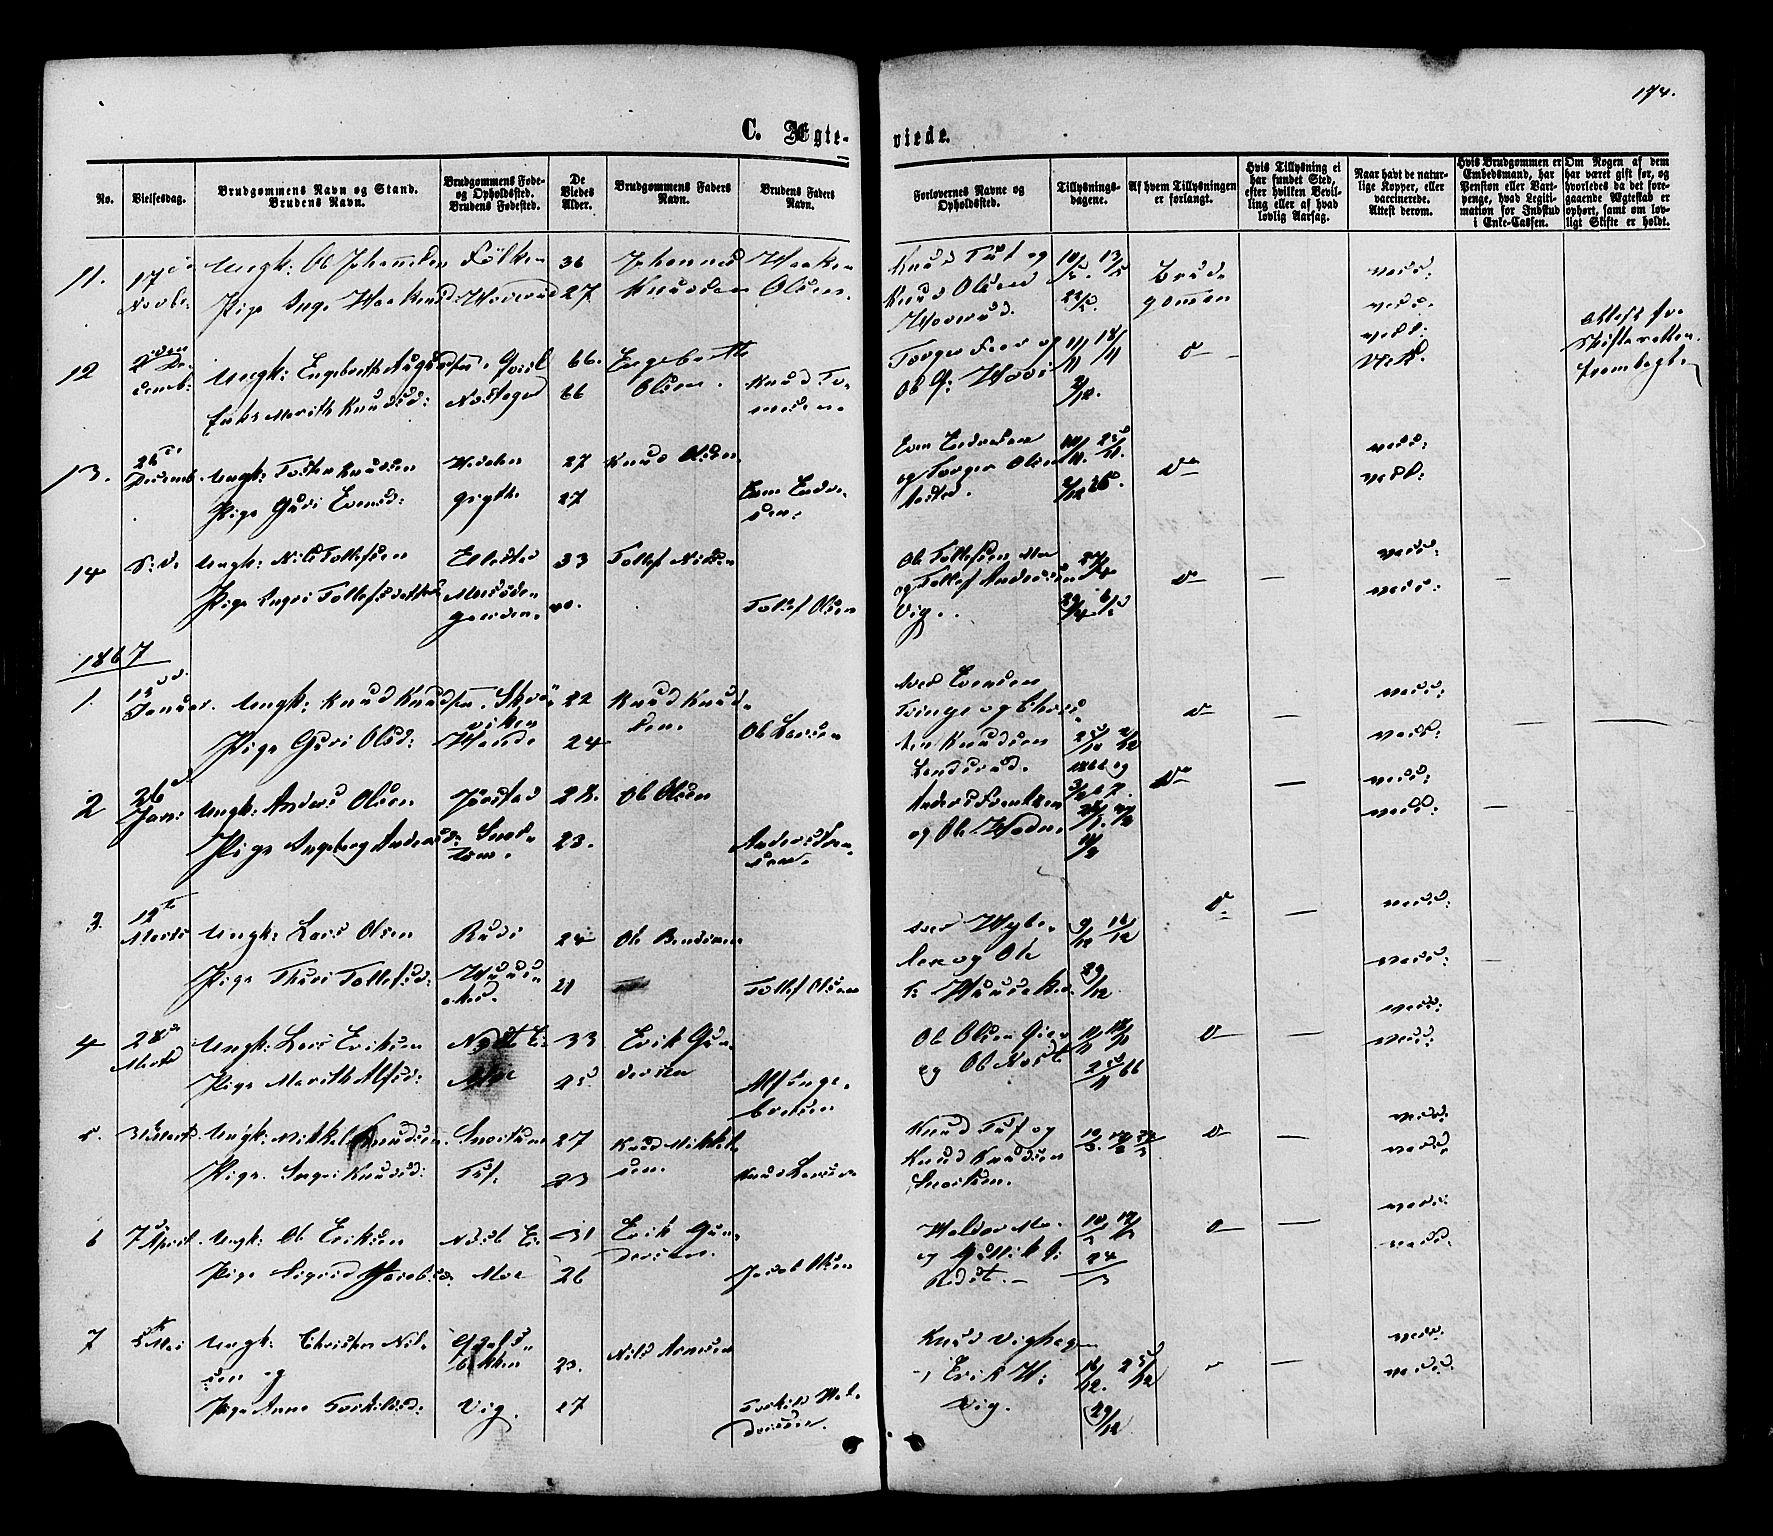 SAH, Vestre Slidre prestekontor, Ministerialbok nr. 3, 1865-1880, s. 174